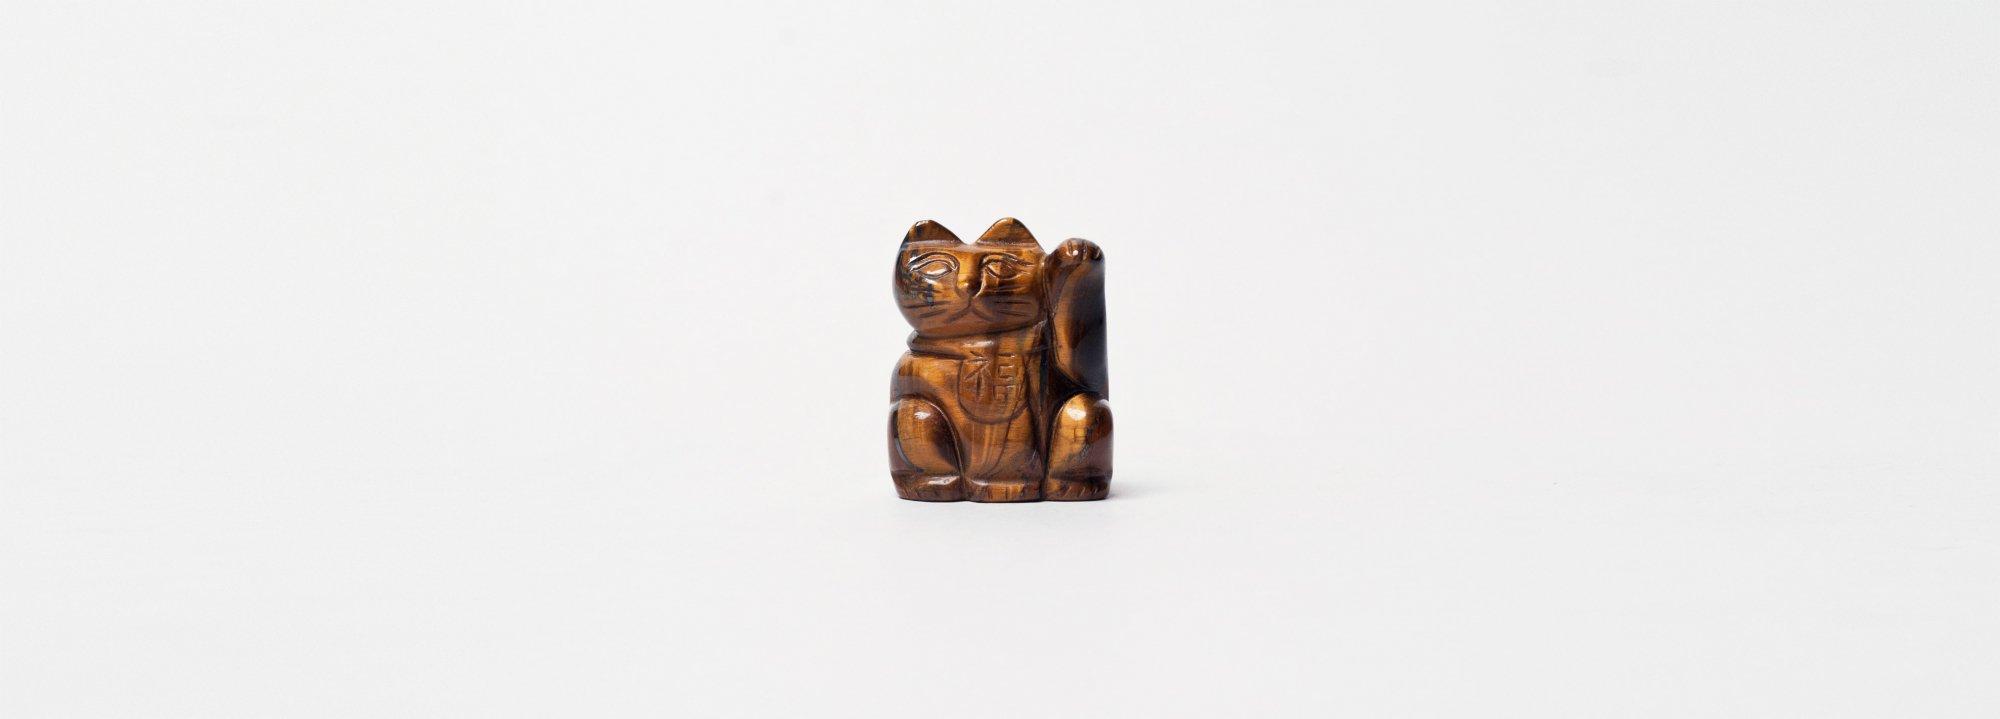 Vintage Object : Stone Manekineko